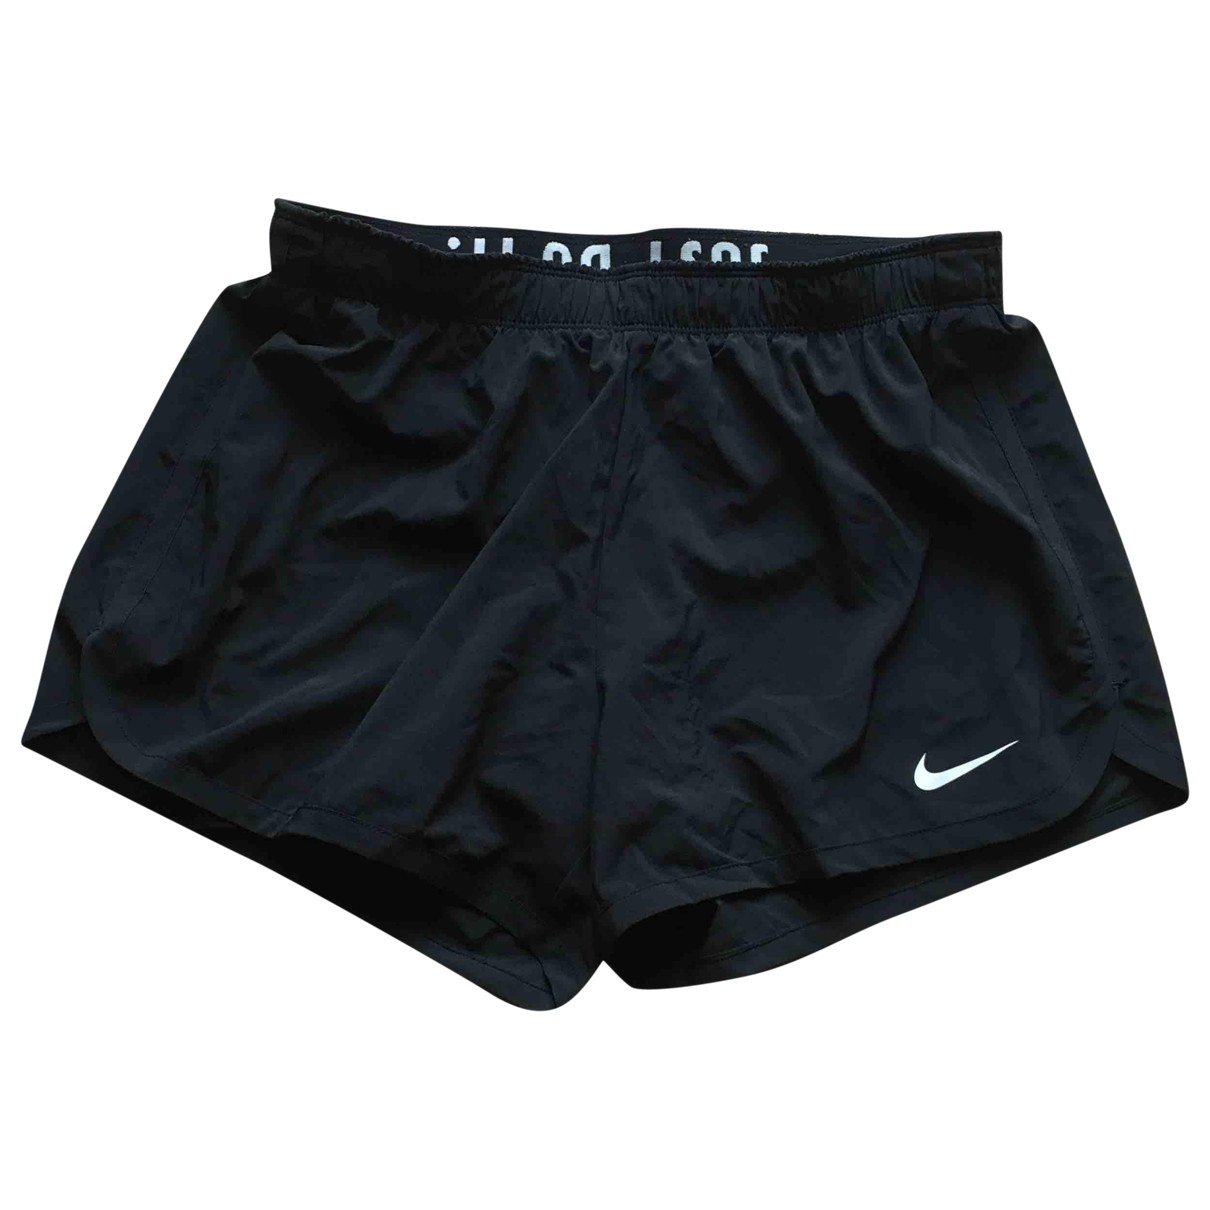 Nike \N Shorts in  Schwarz Polyester